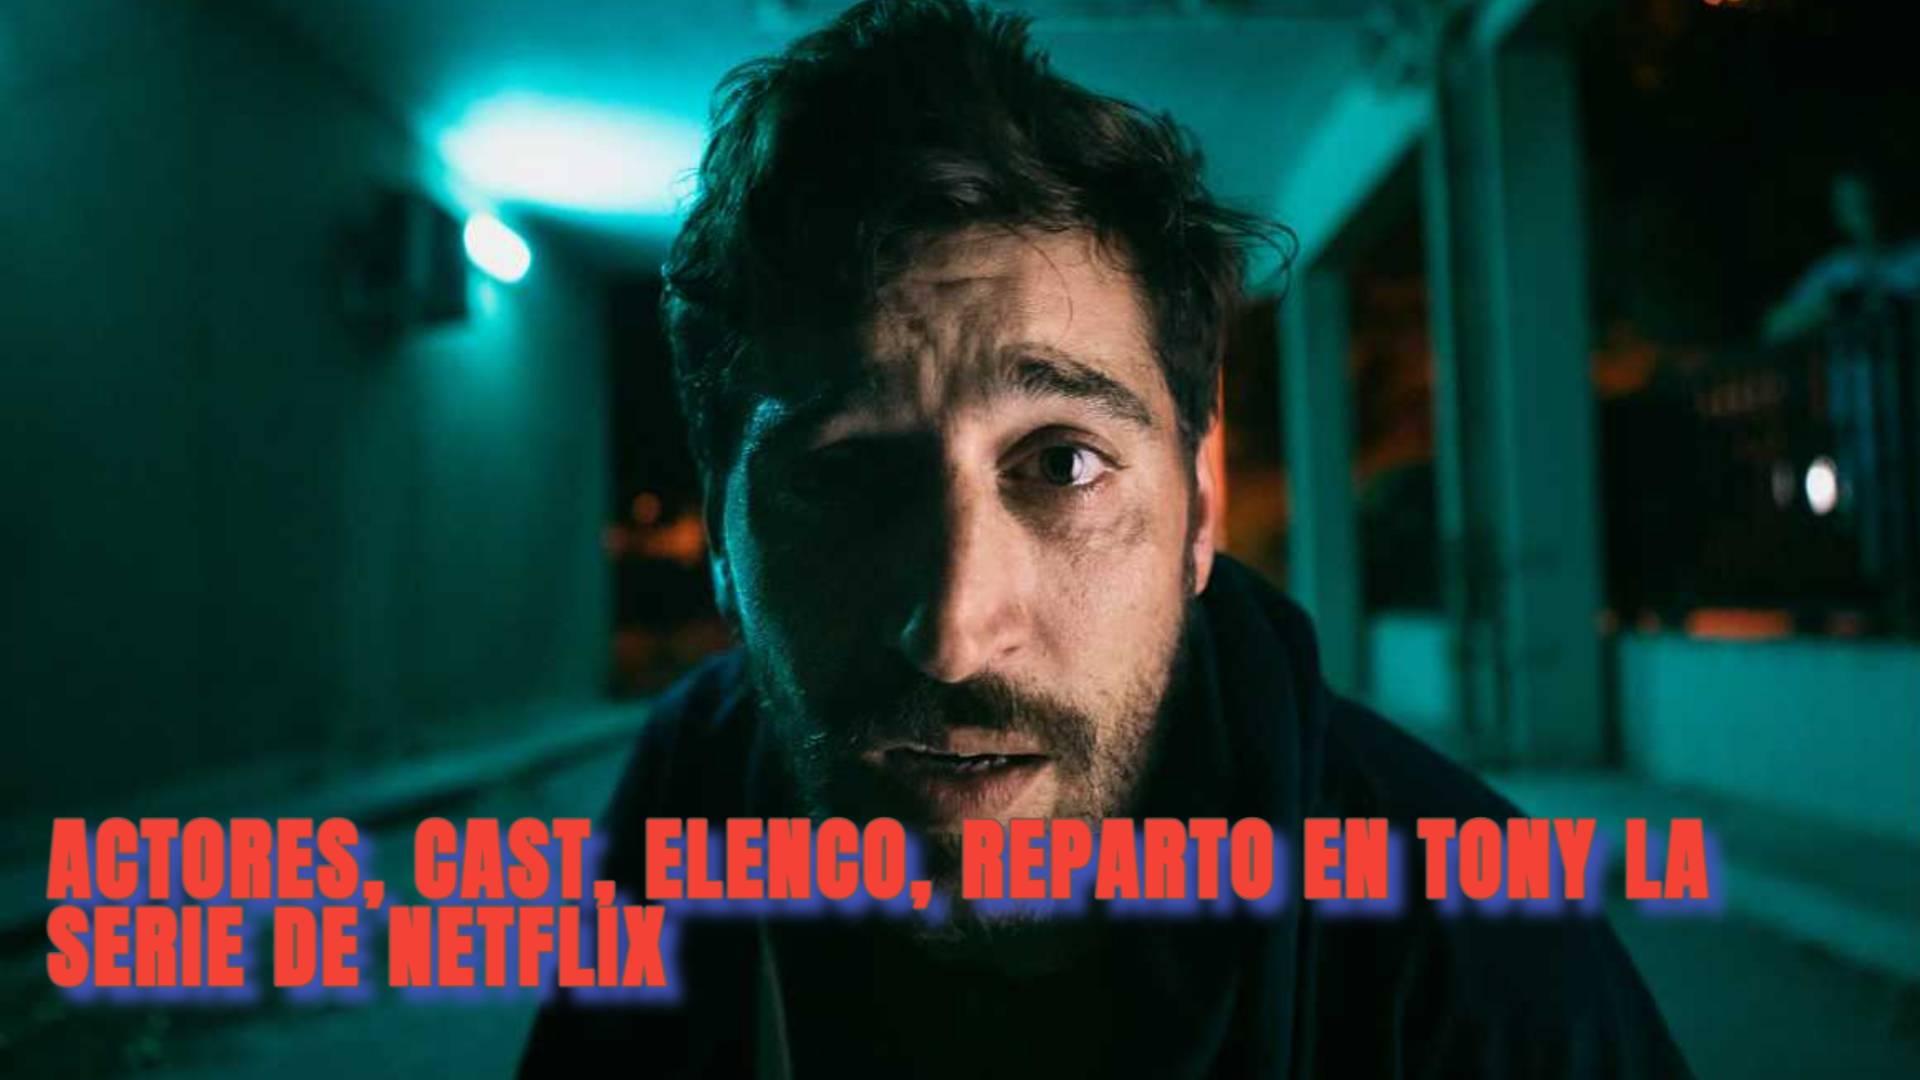 ACTORES, CAST, ELENCO, REPARTO EN TONY LA SERIE DE NETFLIX